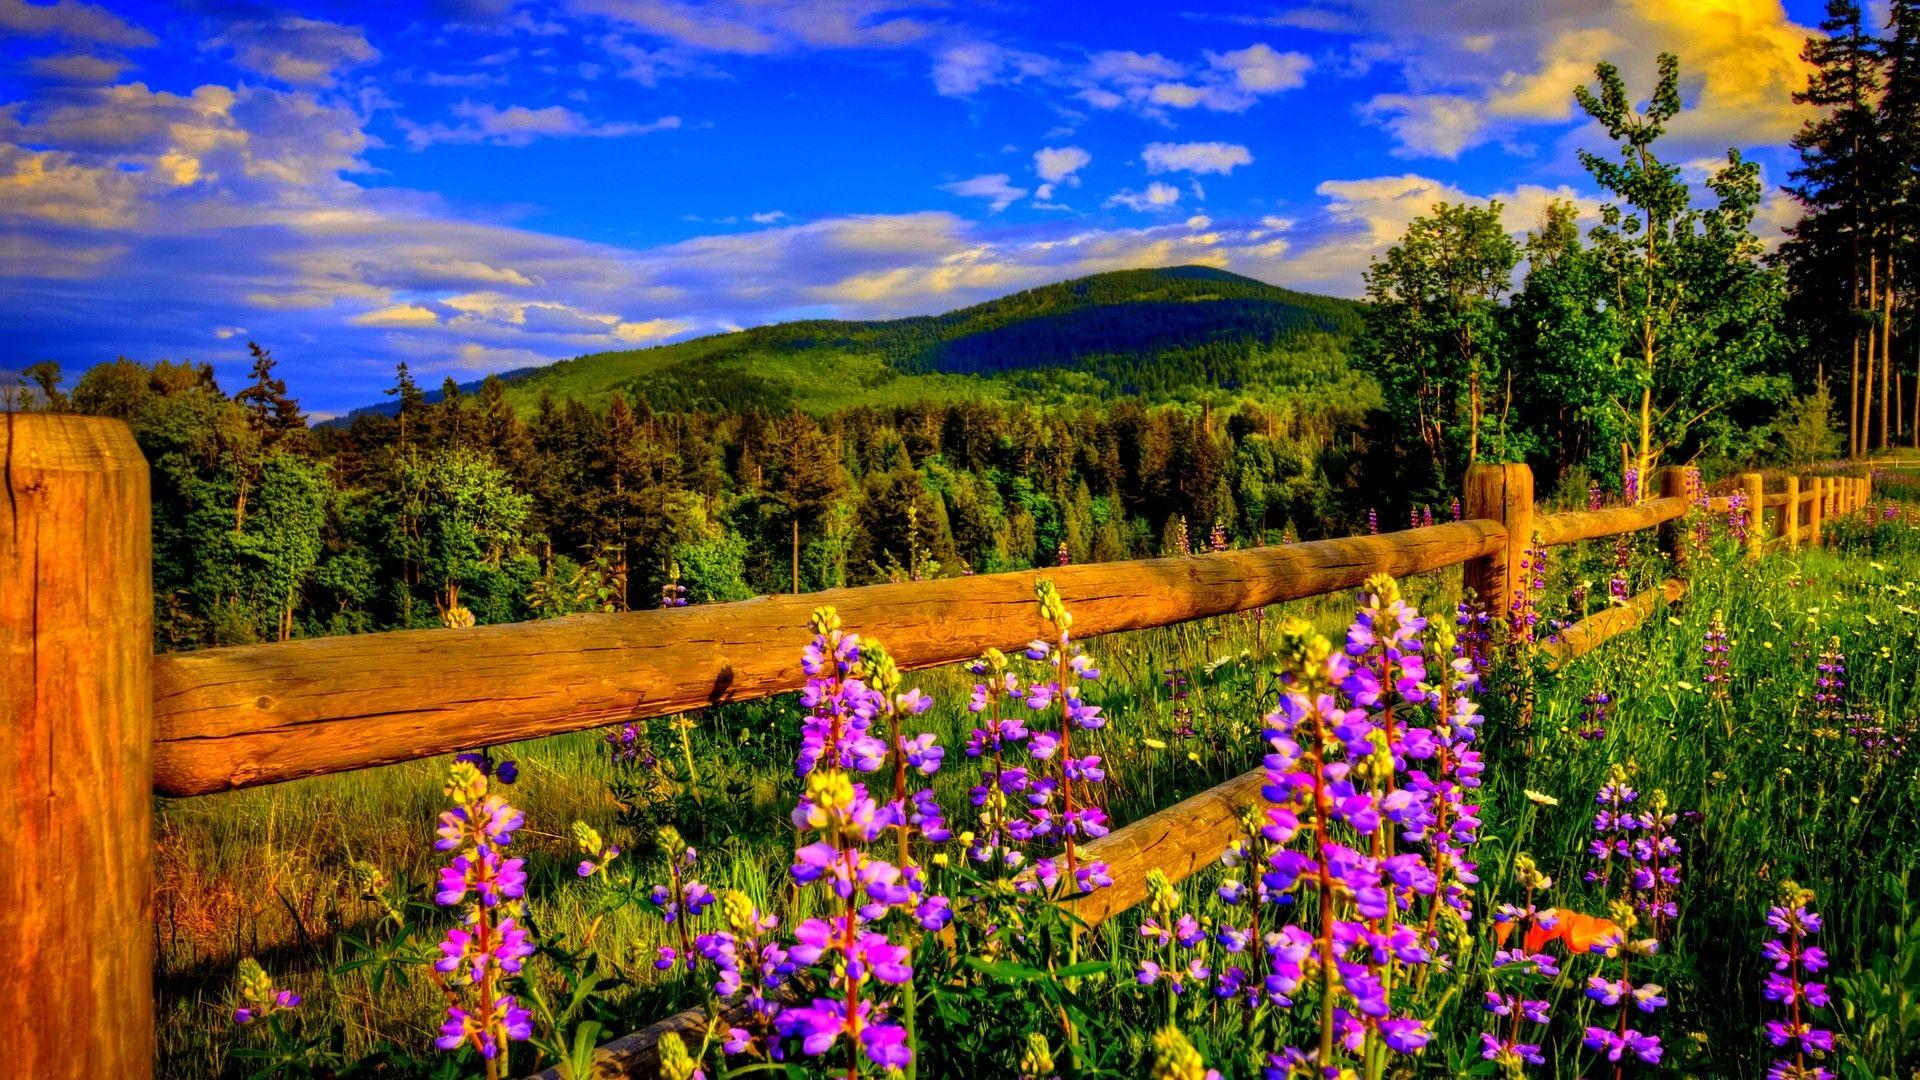 Spring Hd Backgrounds 2021 Live Wallpaper Hd Spring Background Spring Pictures Colorful Landscape